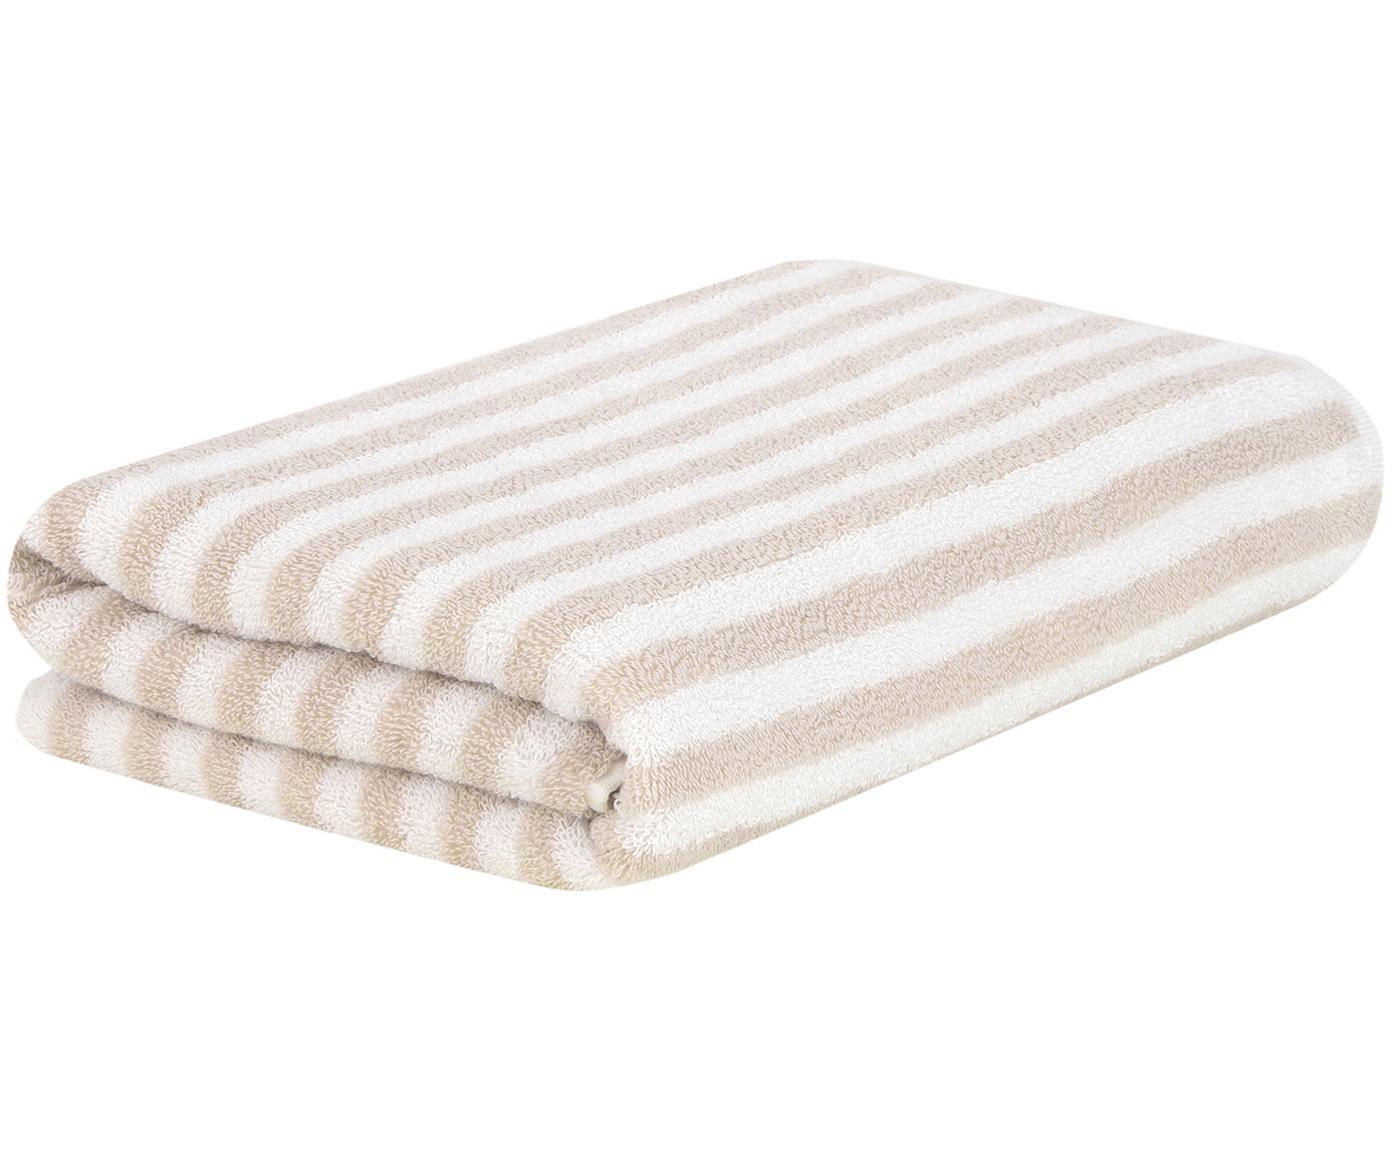 Handdoek Viola, 100% katoen, middelzware kwaliteit, 550 g/m², Zandkleurig, crèmewit, Handdoek